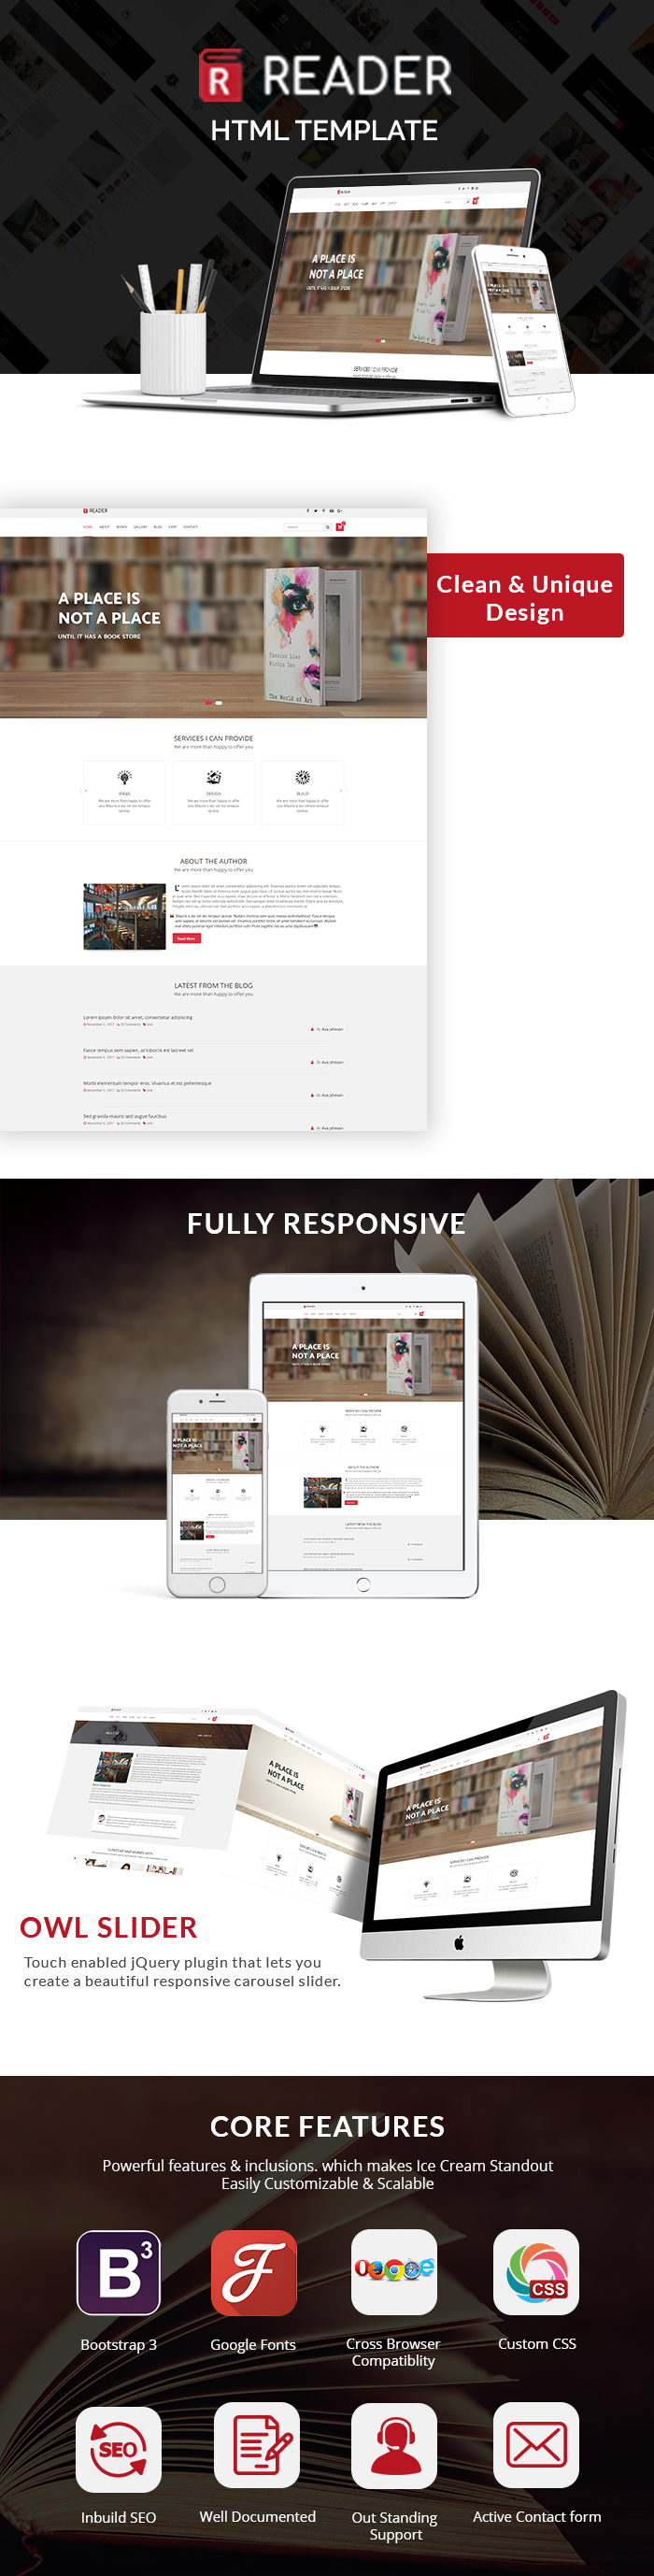 Reader Book Store HTML Website Templates